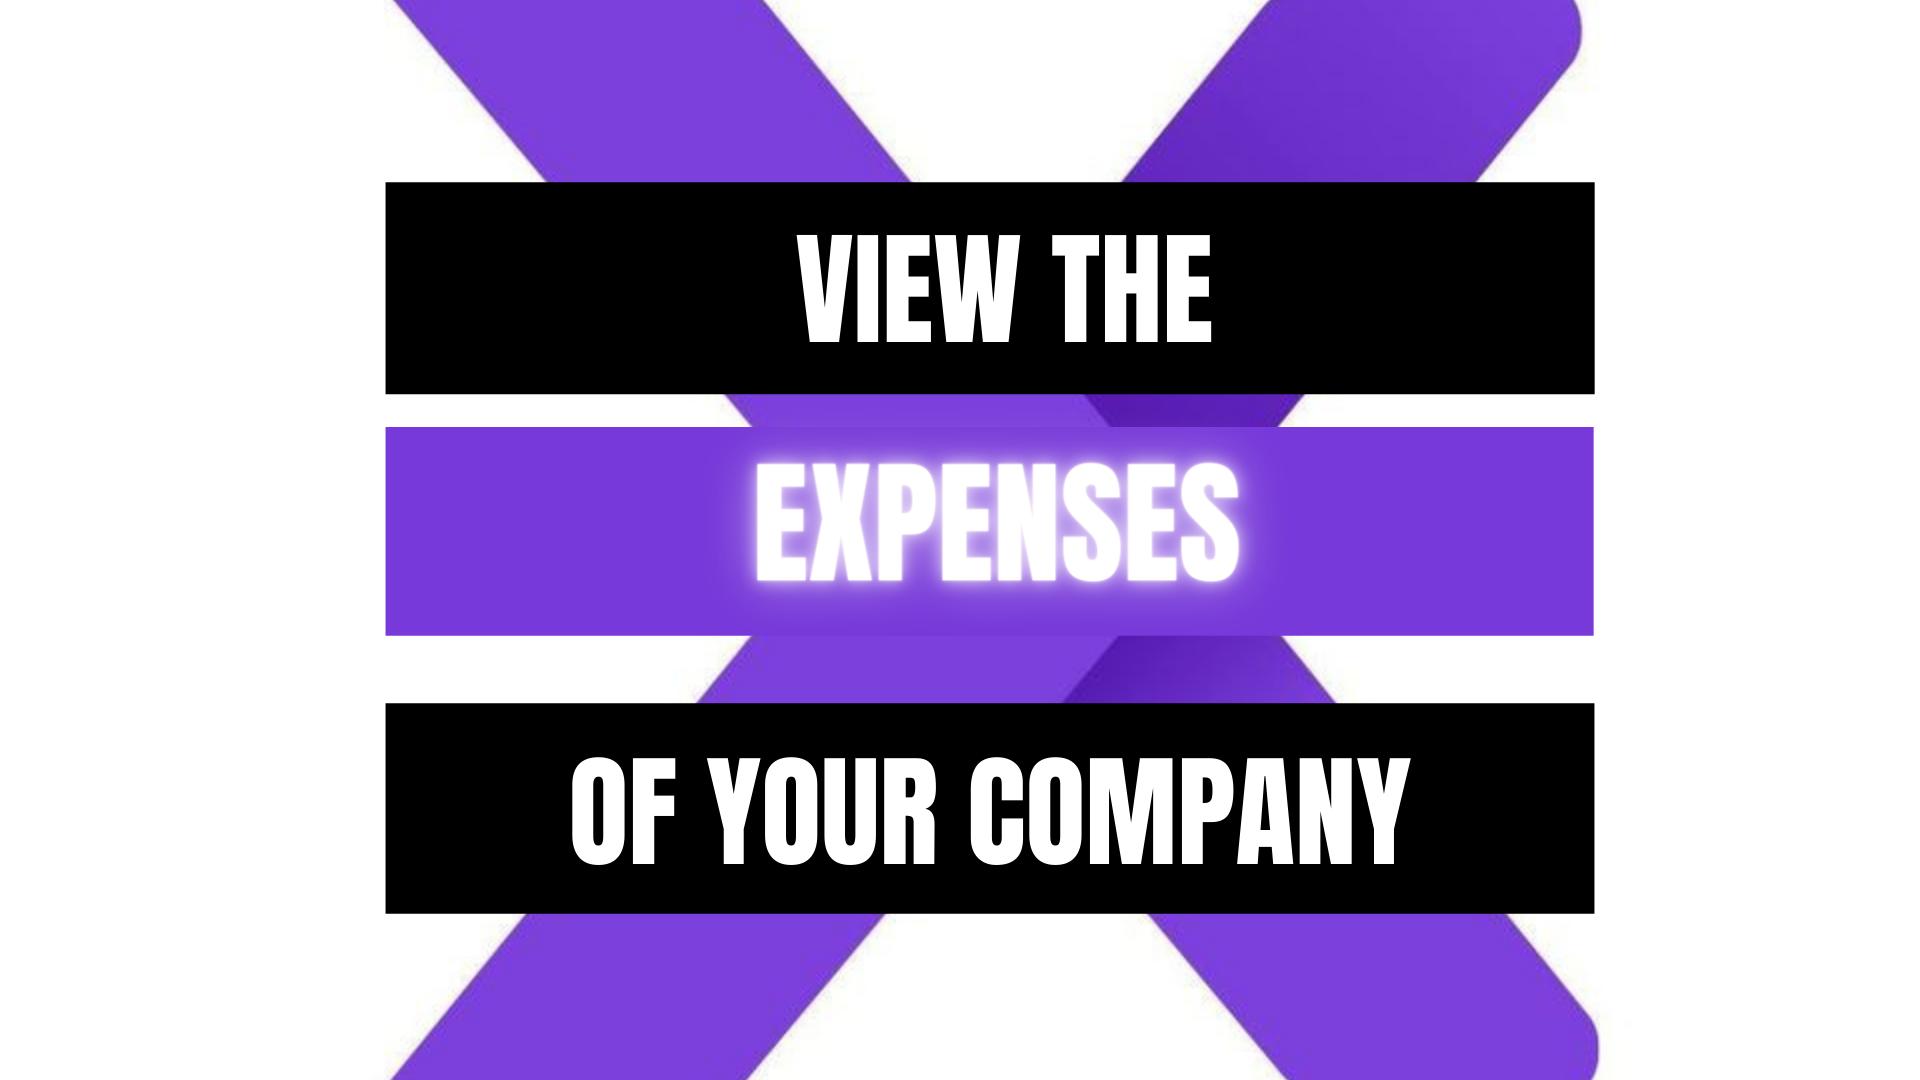 Peekaboox - View Company Expenses